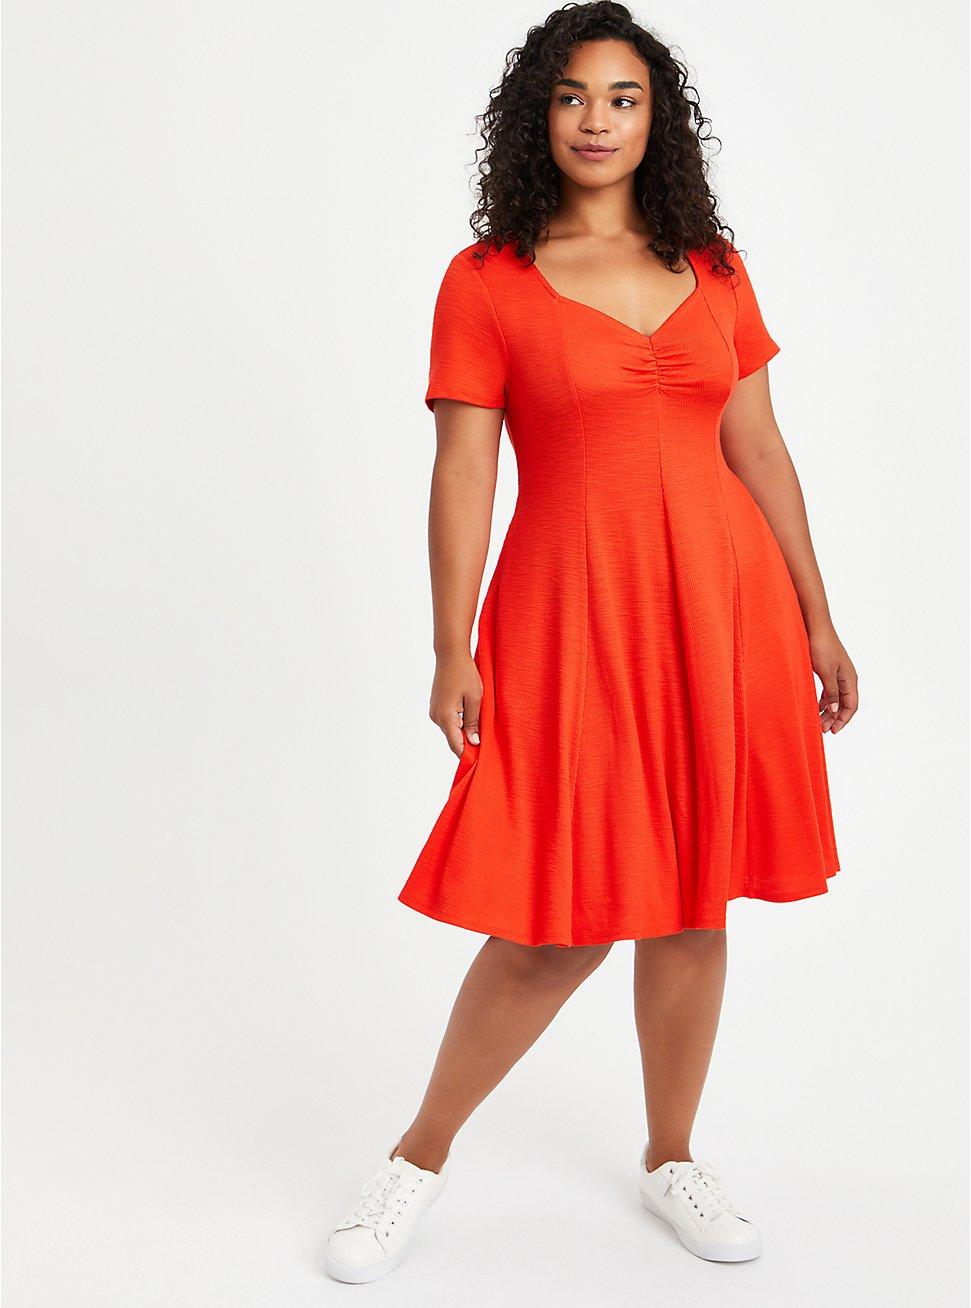 Sweetheart Fit & Flare Ribbed Midi Dress - Orange, GRENADINE, hi-res